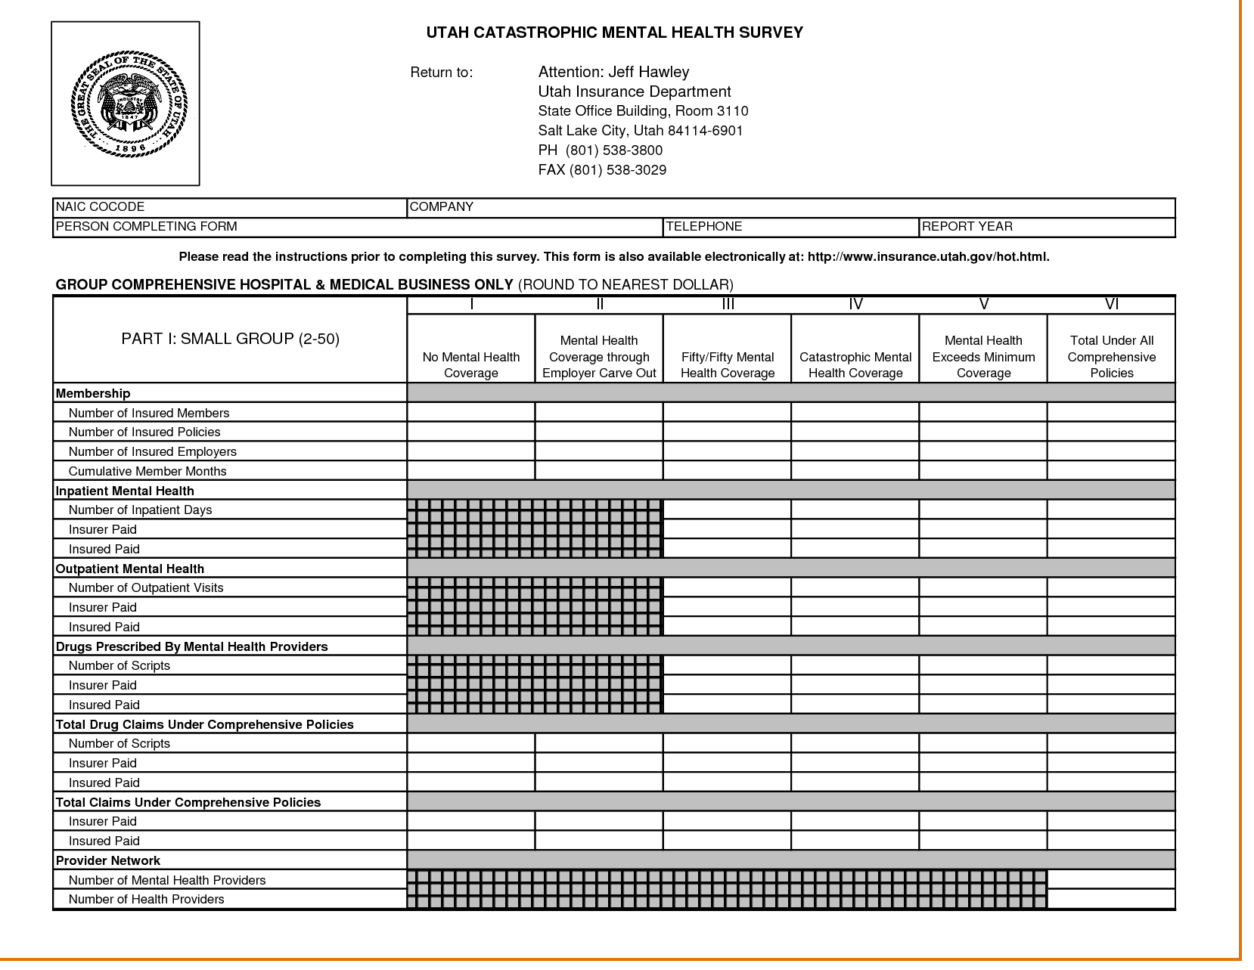 Survey Data Excel Template